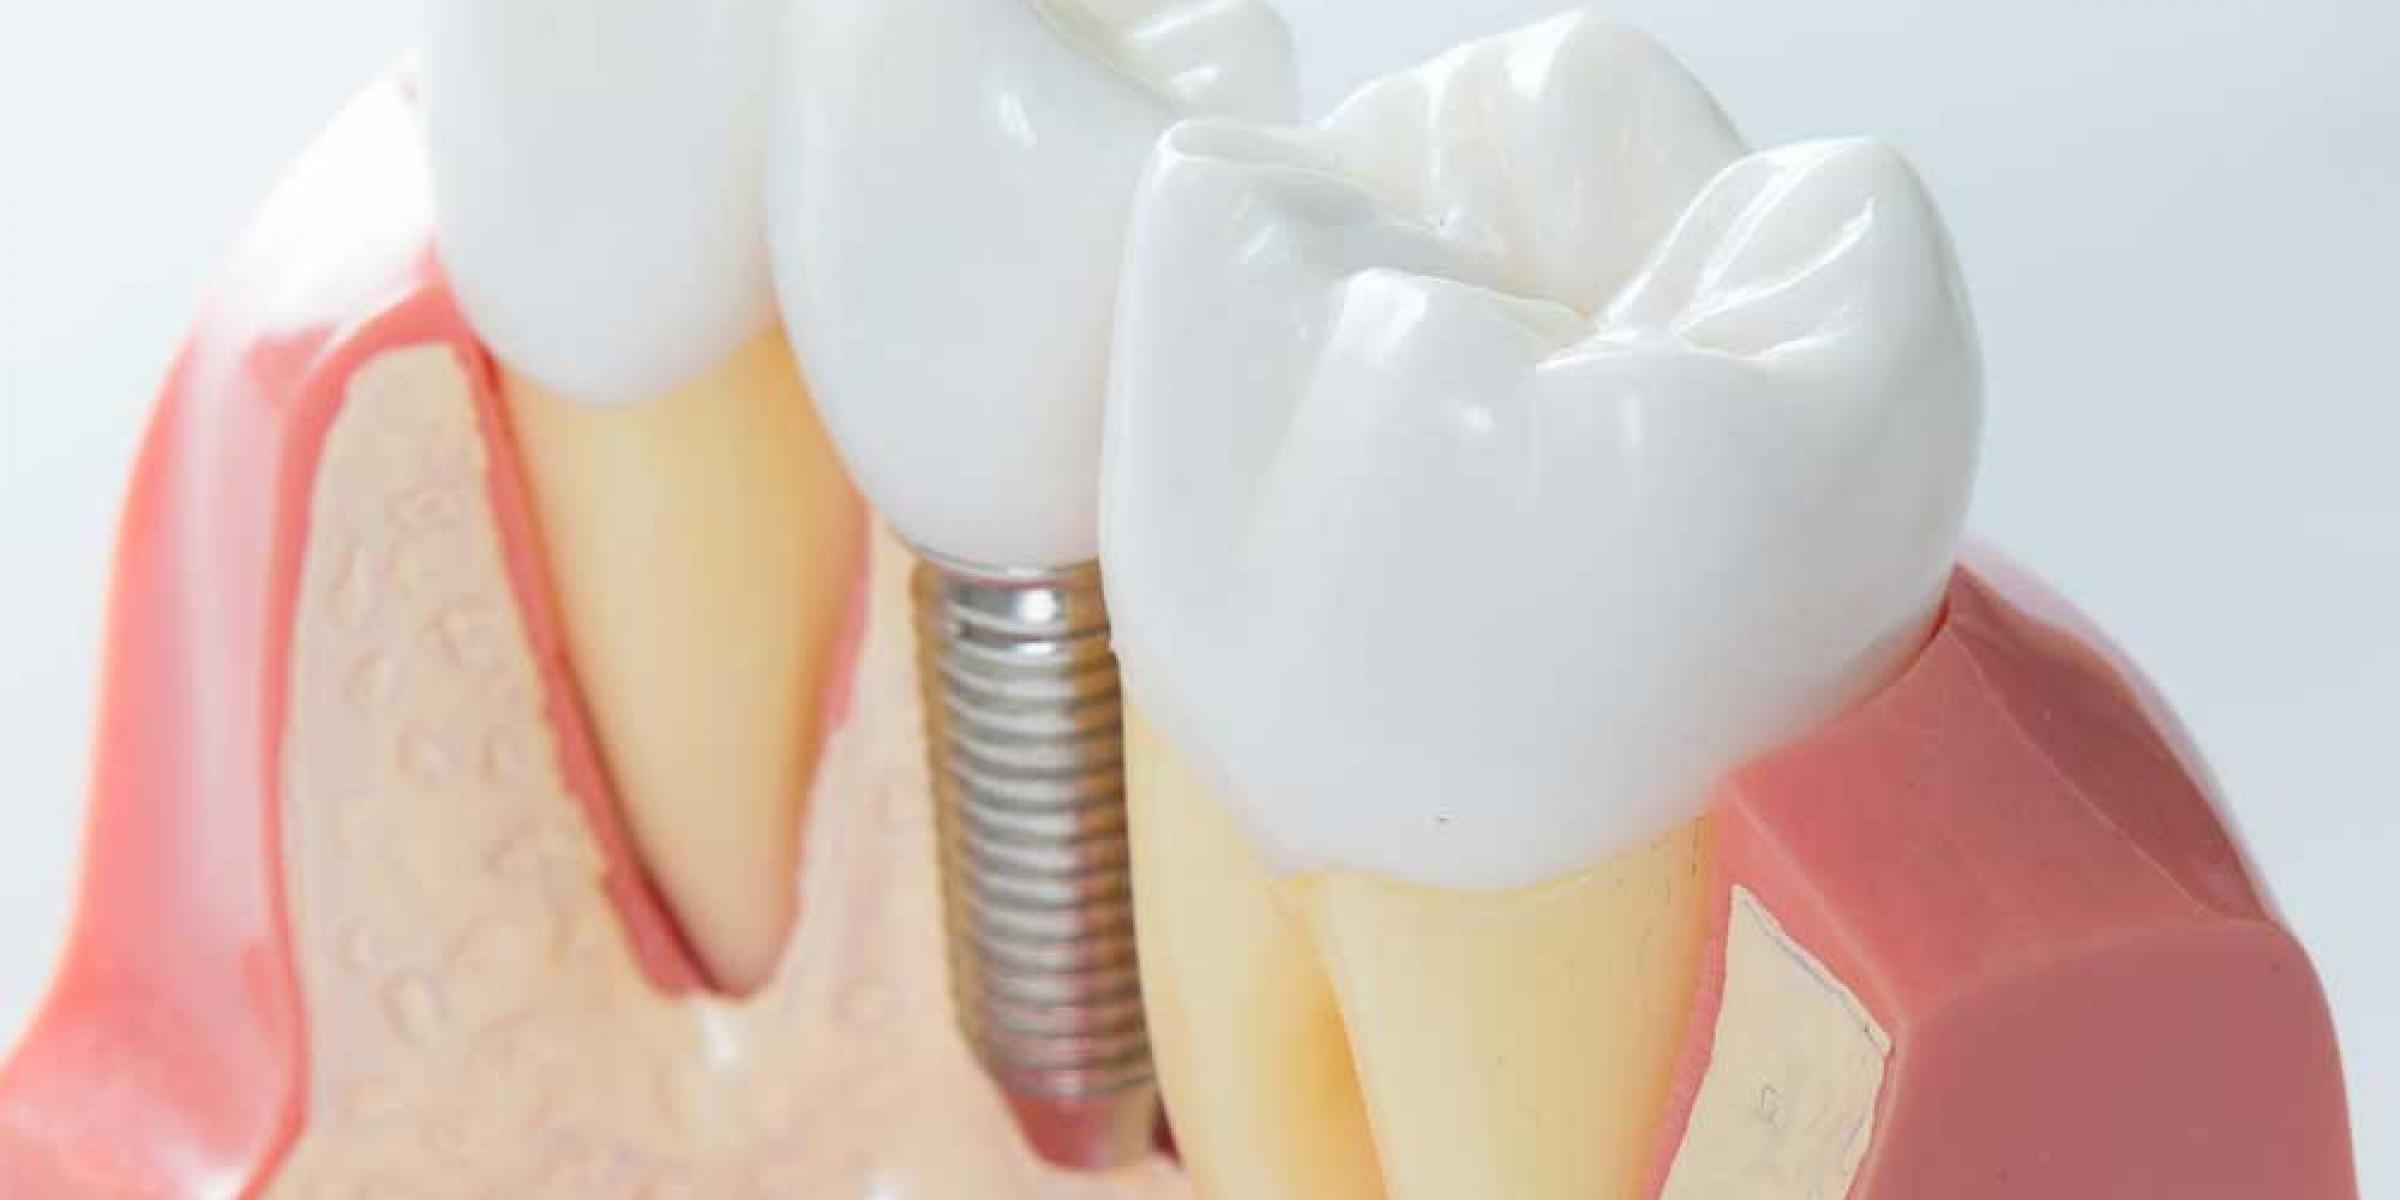 implantologia-dentale5-7940b09f9c